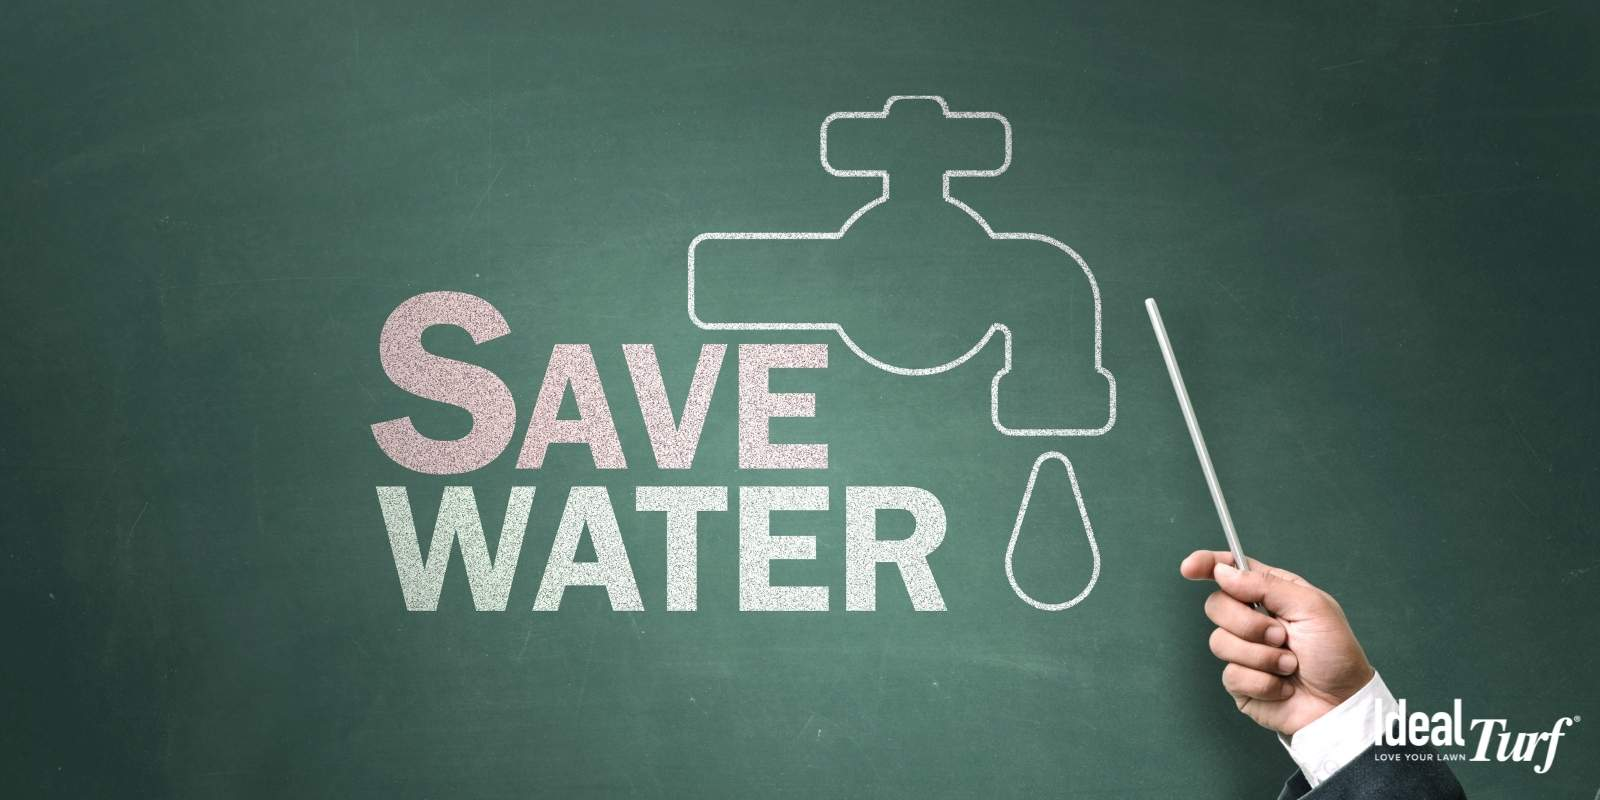 8. Saves Water